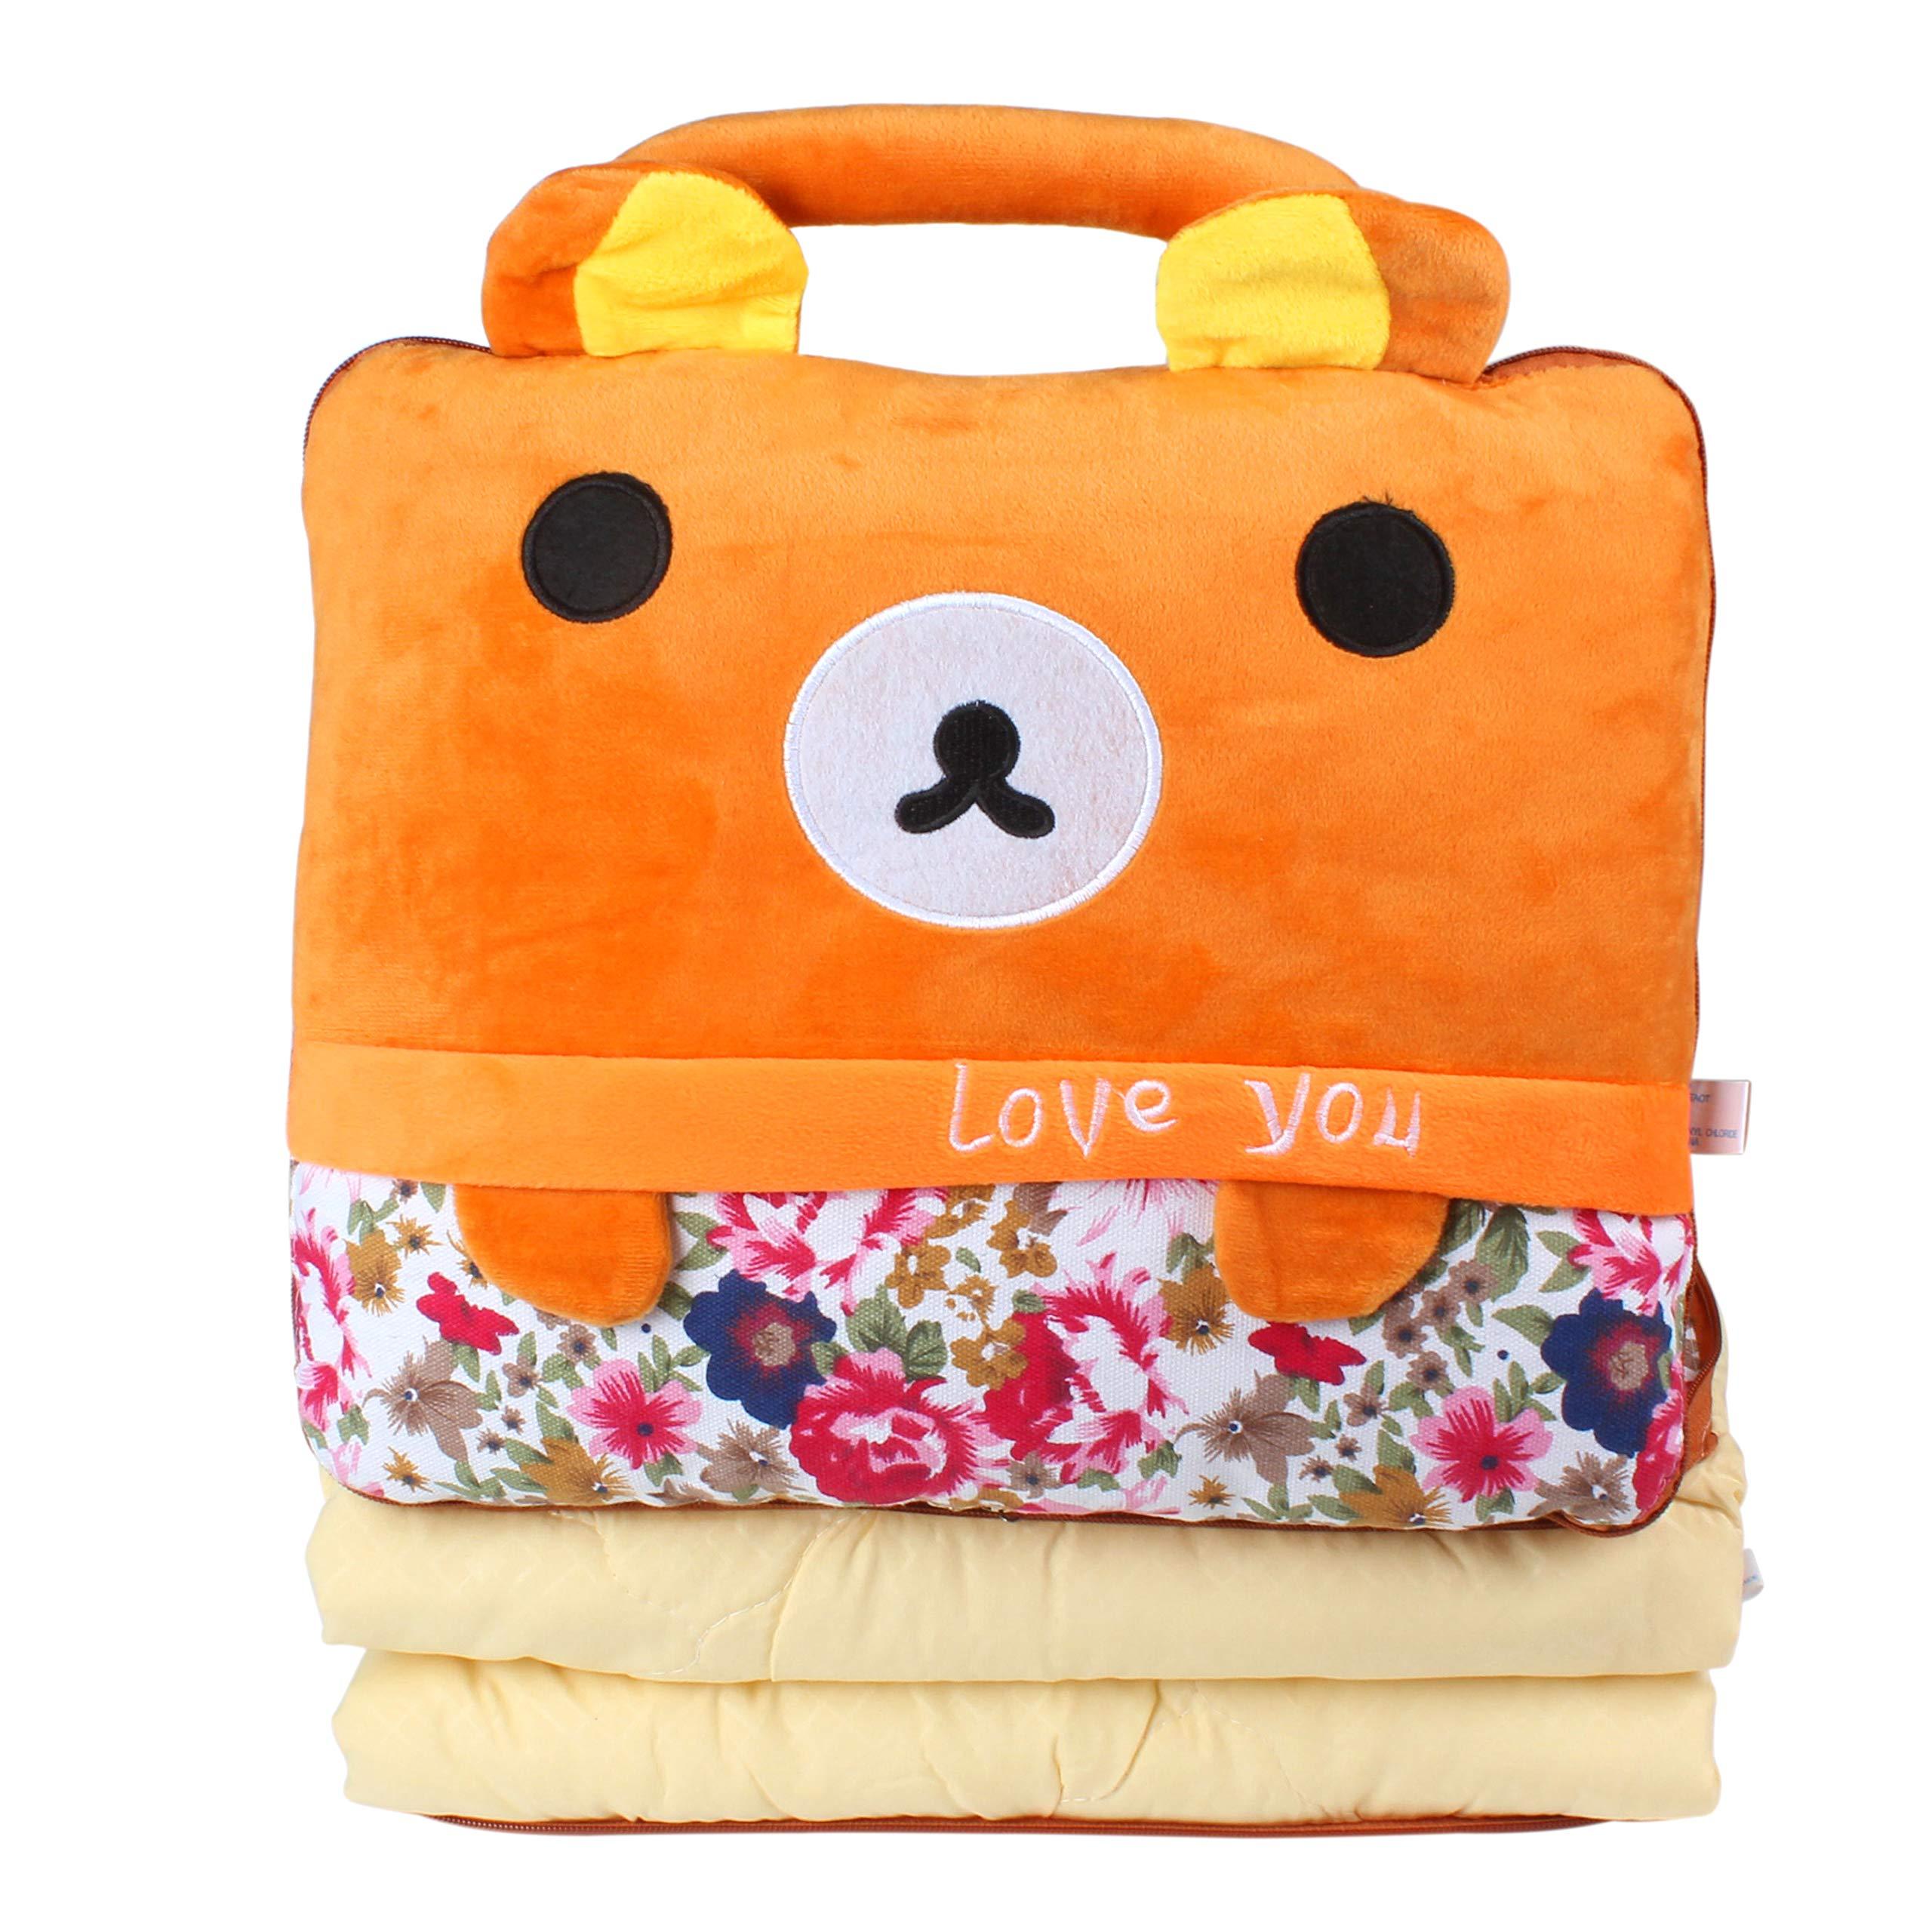 Alpacasso 2 in 1 Cute Cartoon Plush Stuffed Animal Motifs Backrest Portable Throw Pillow Blanket Set. (B)